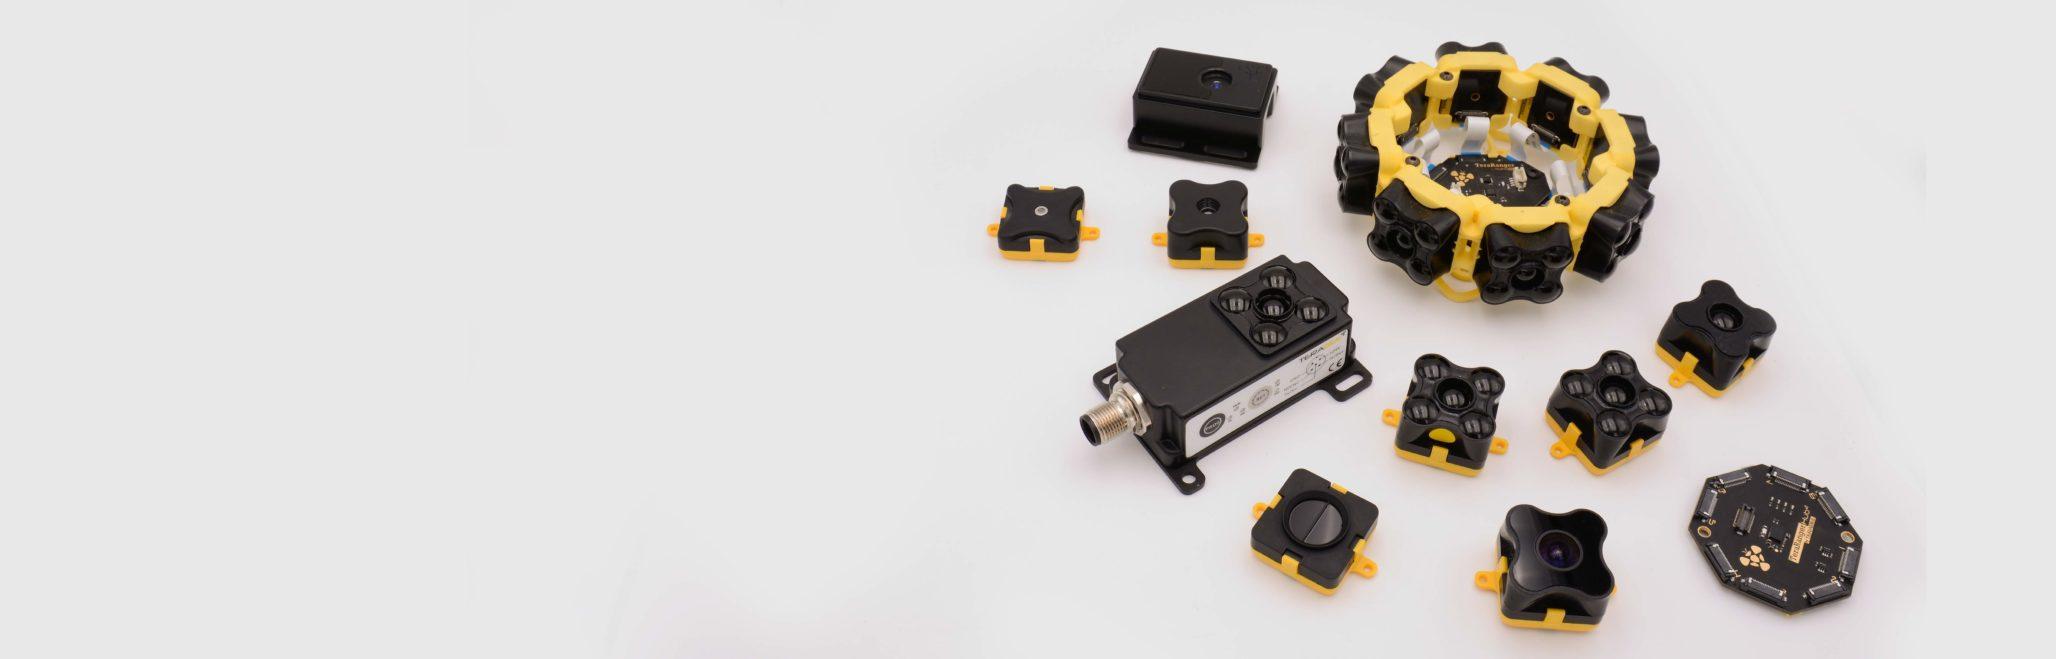 Benner Products Evo Mini